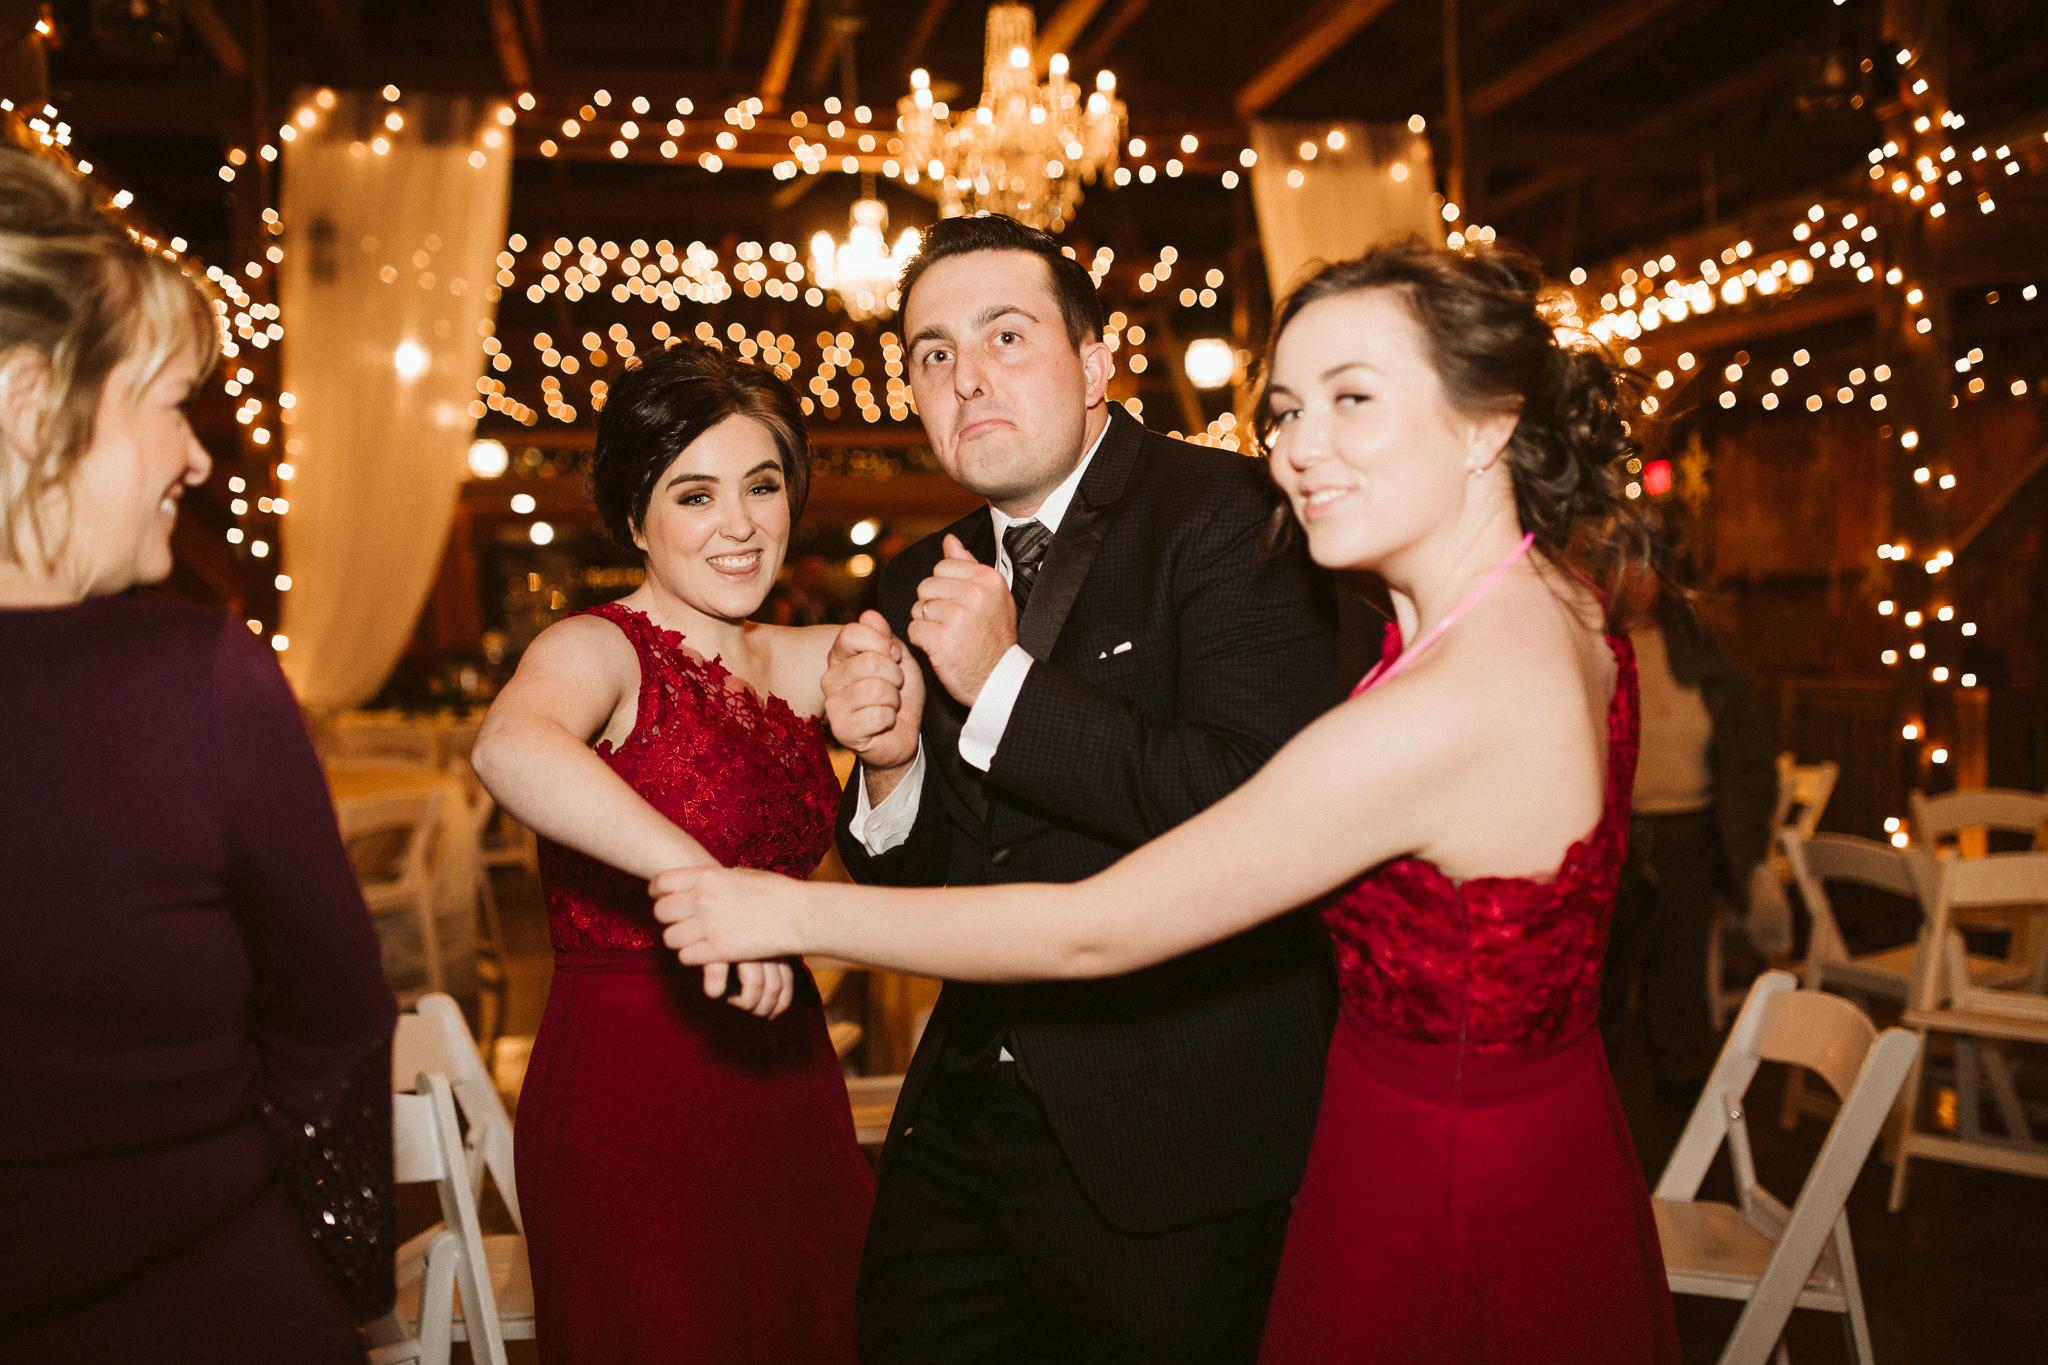 0187 Ariana Jordan Photo - Cameron & Lauren's Wedding at Talon Winery  8858.jpg